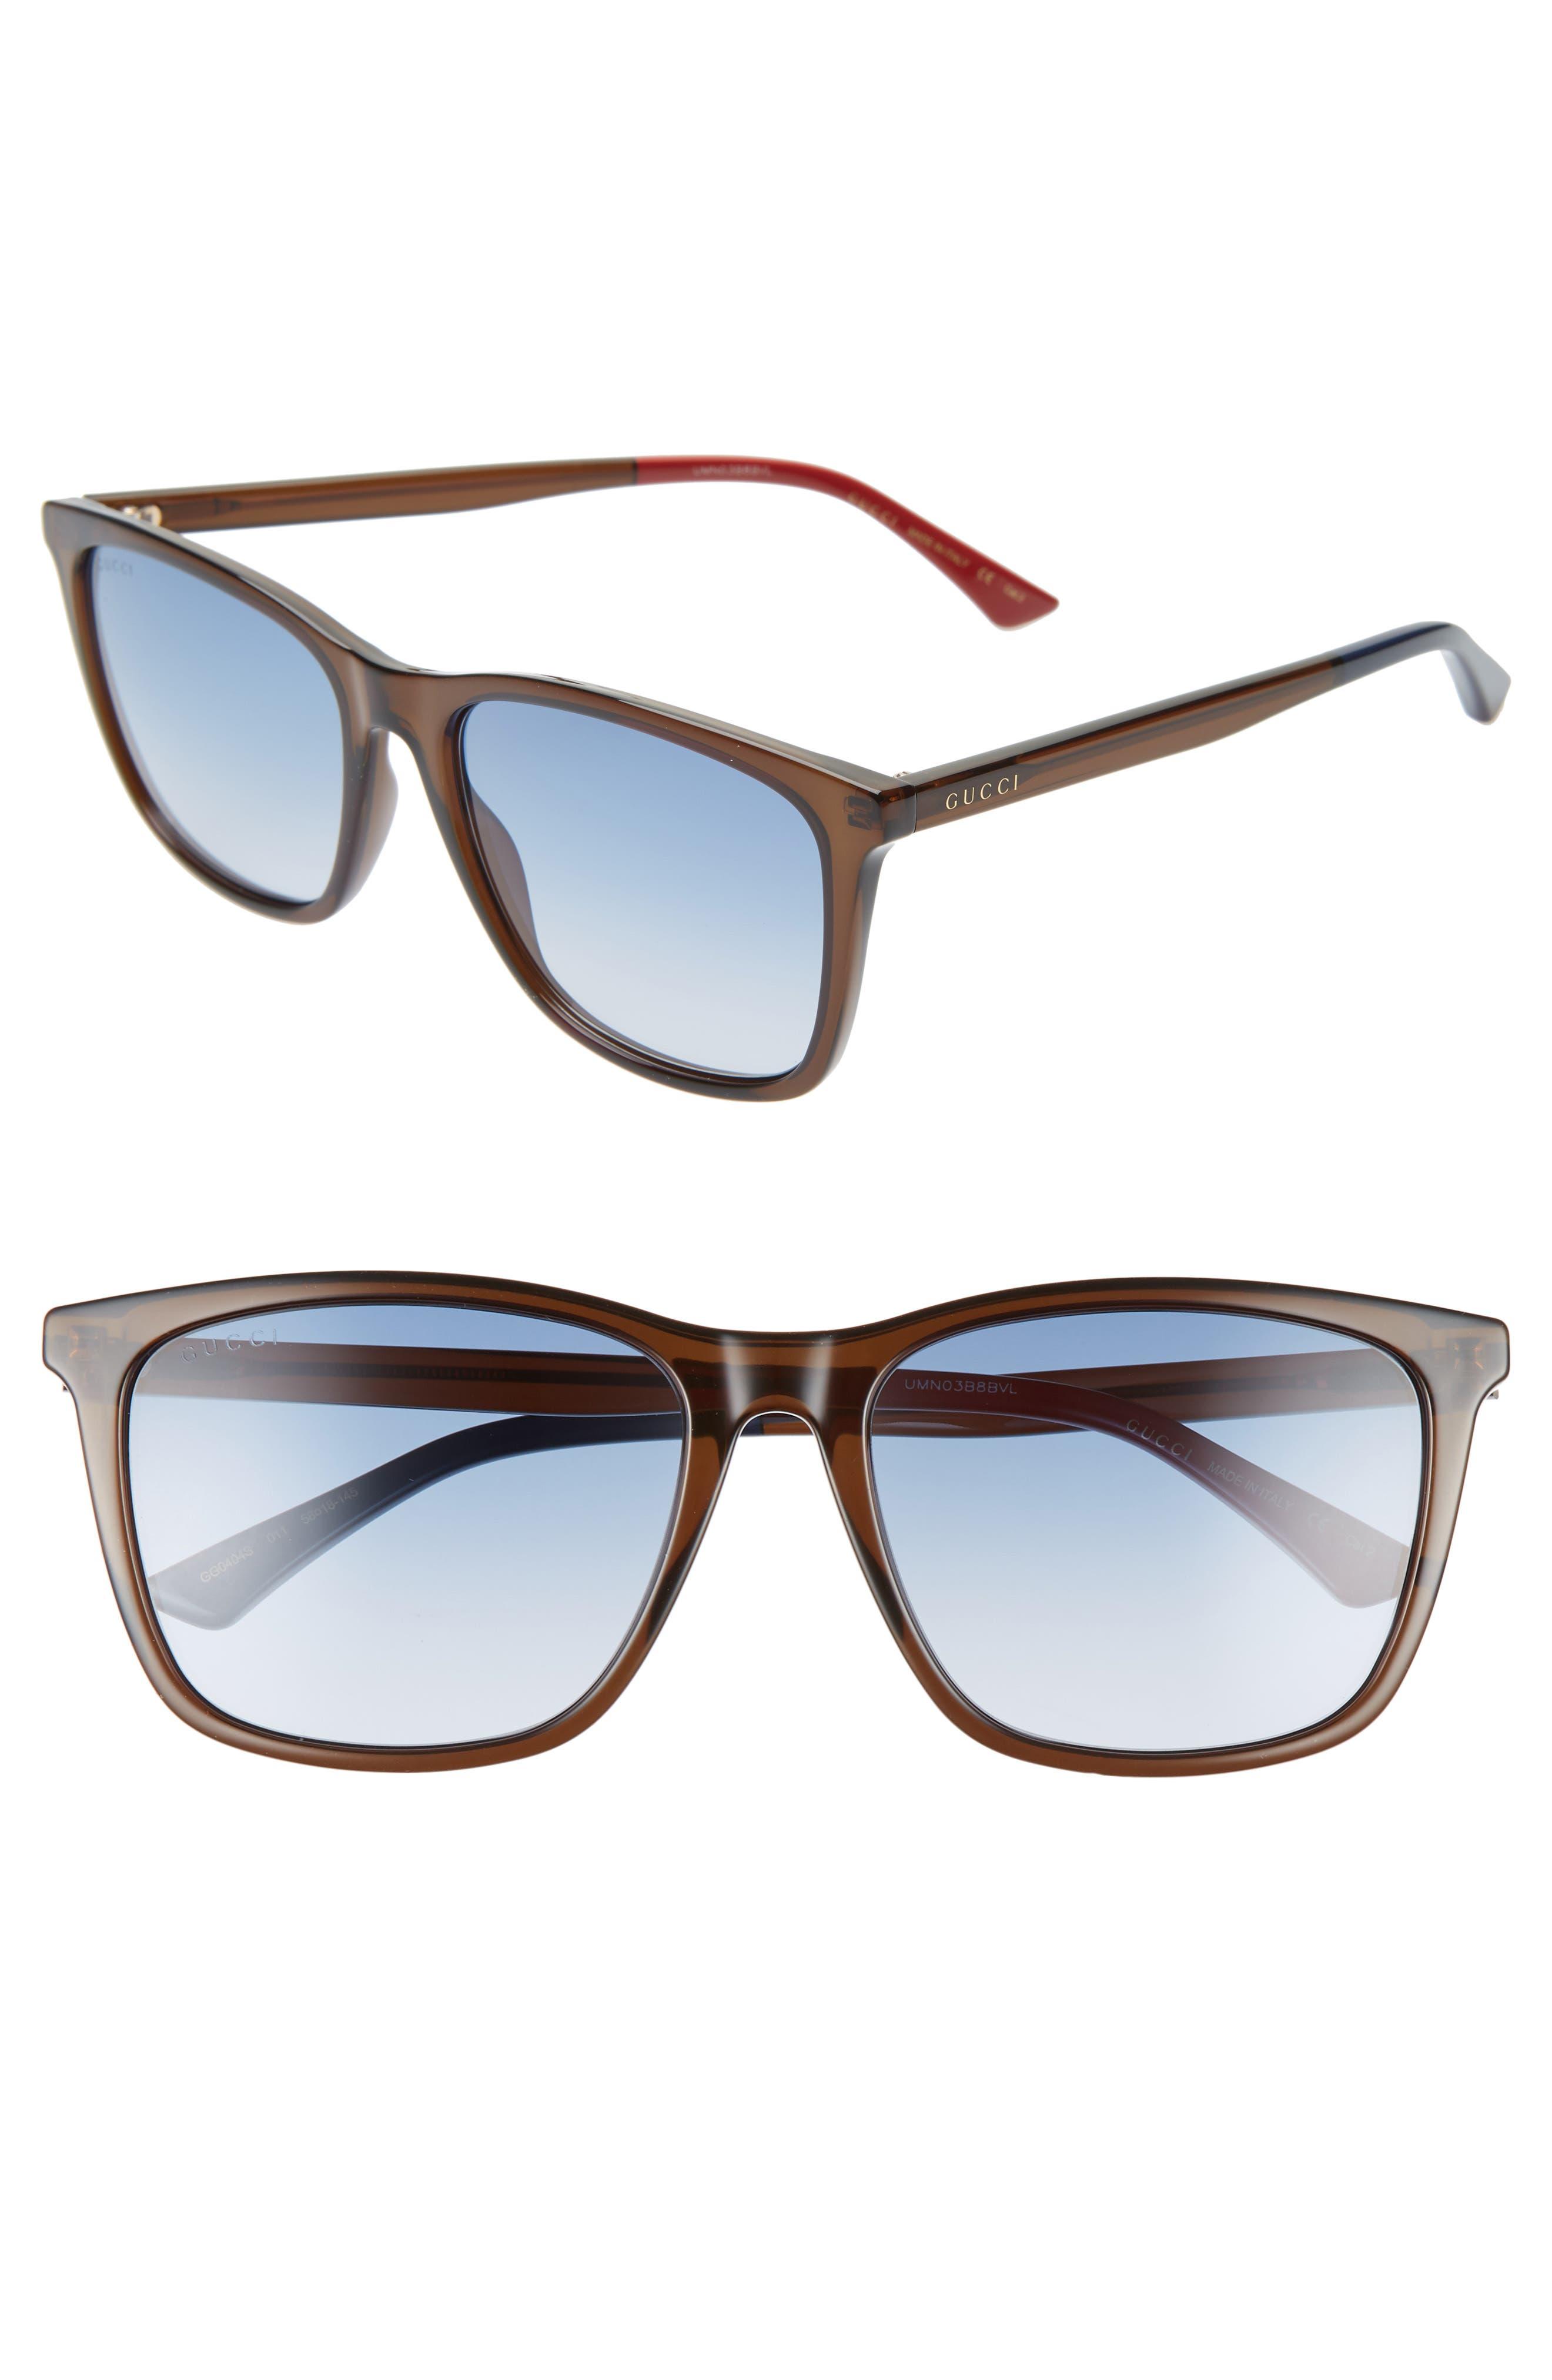 842a2118cc0 Men s Sunglasses -  300 to  400